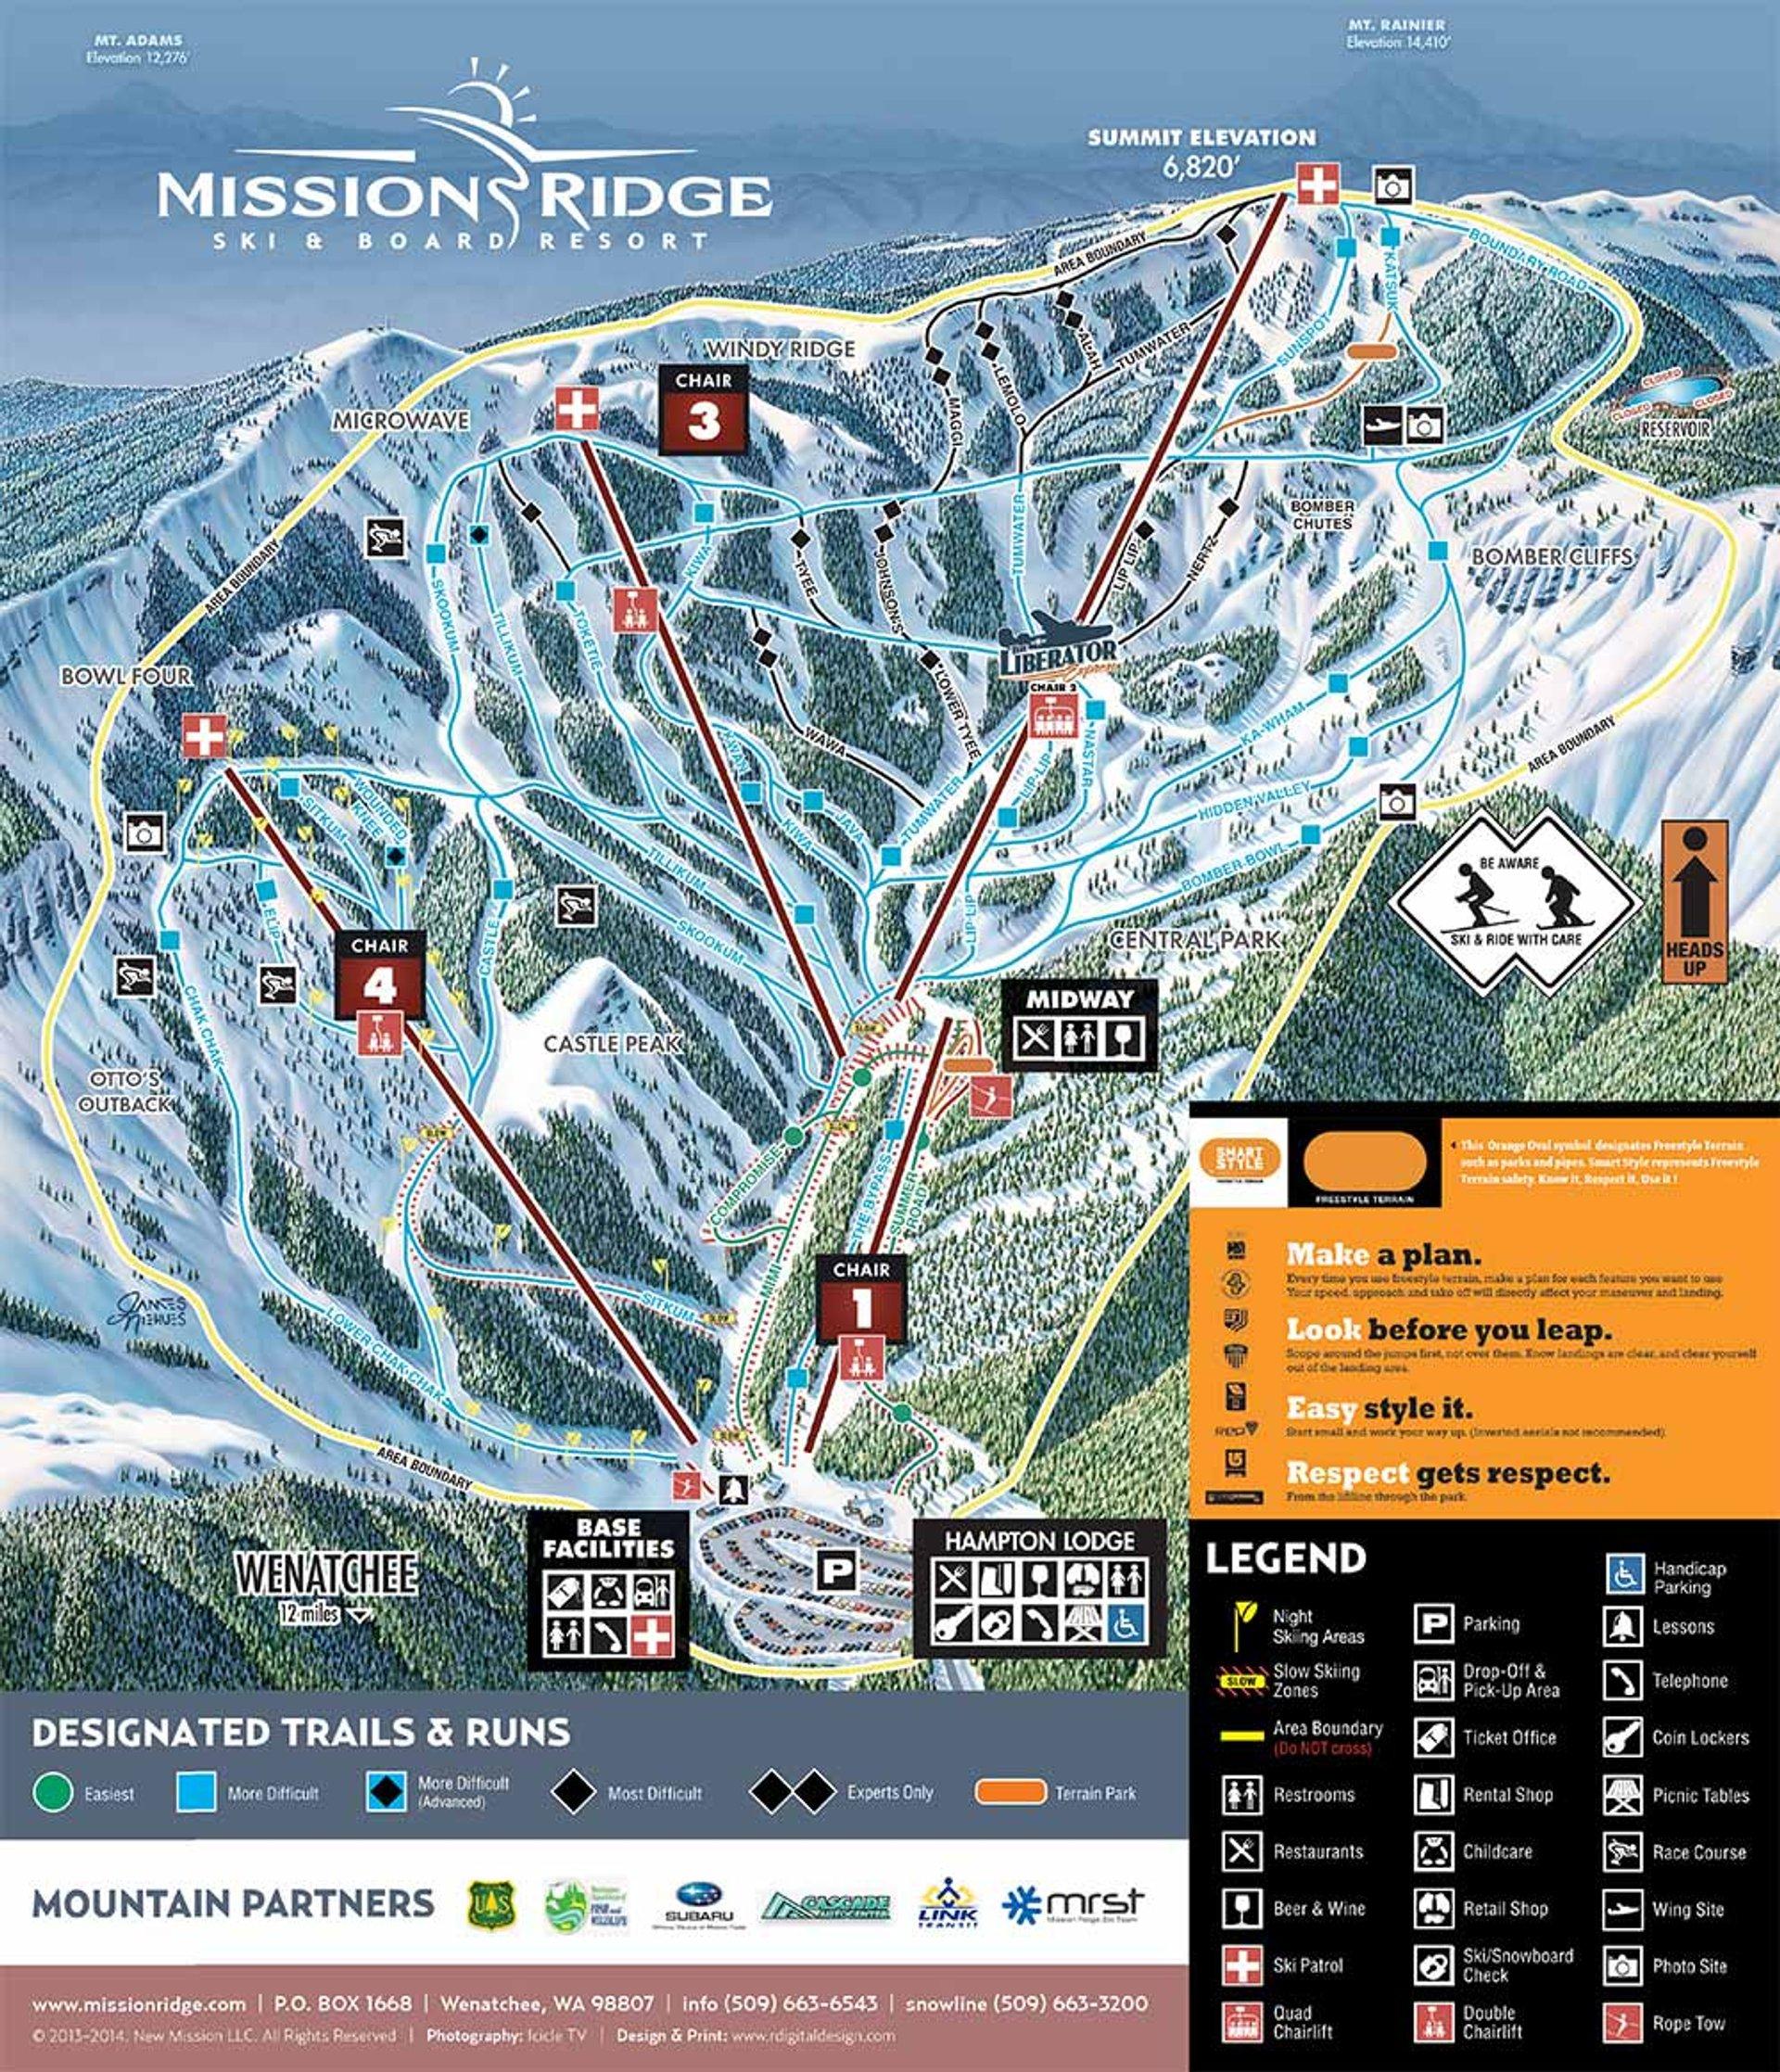 Skiing and Snowboarding in Washington - Best Season 2020